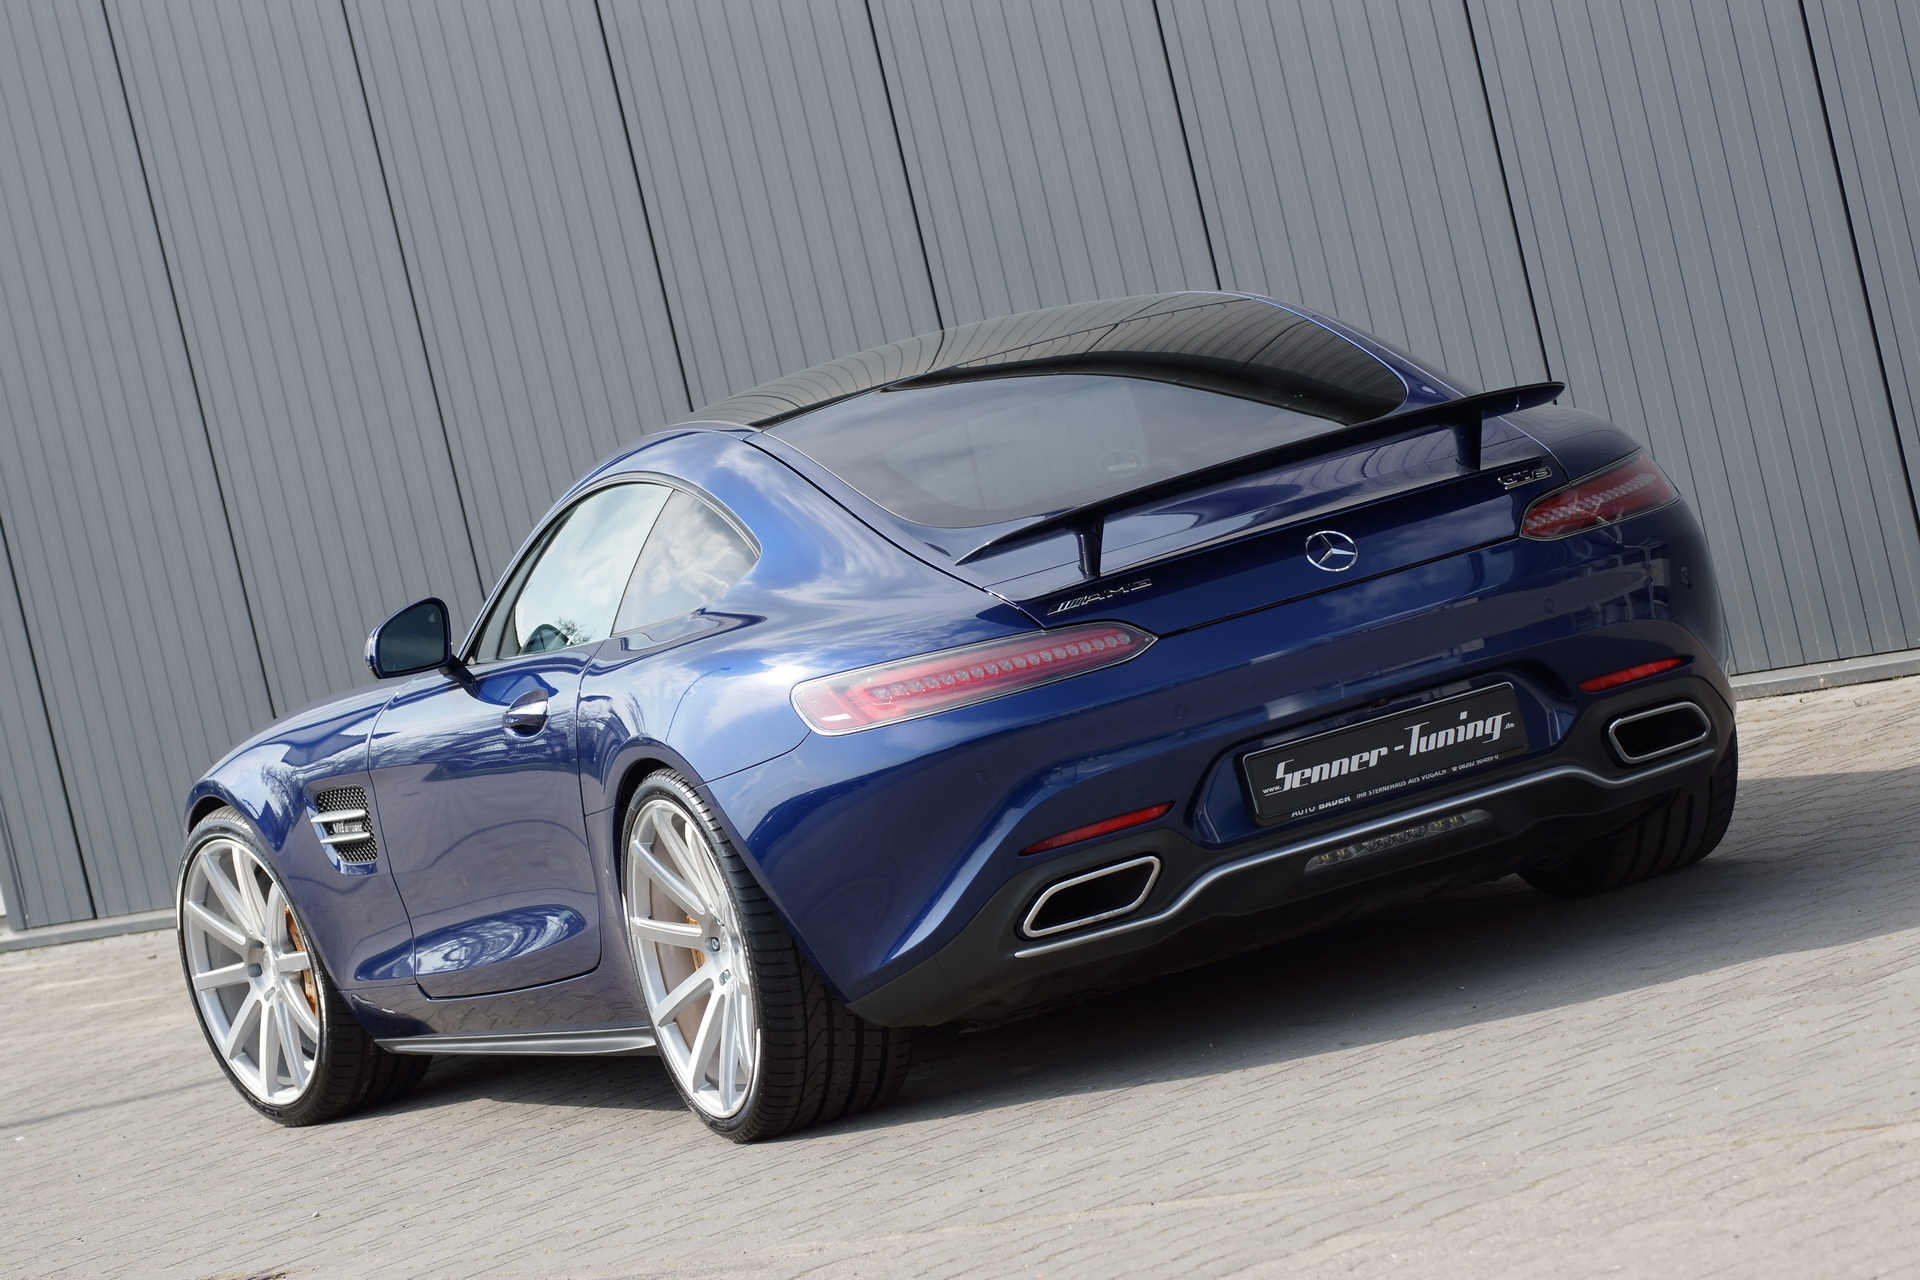 Mercedes-AMG GT S Senner Tuning